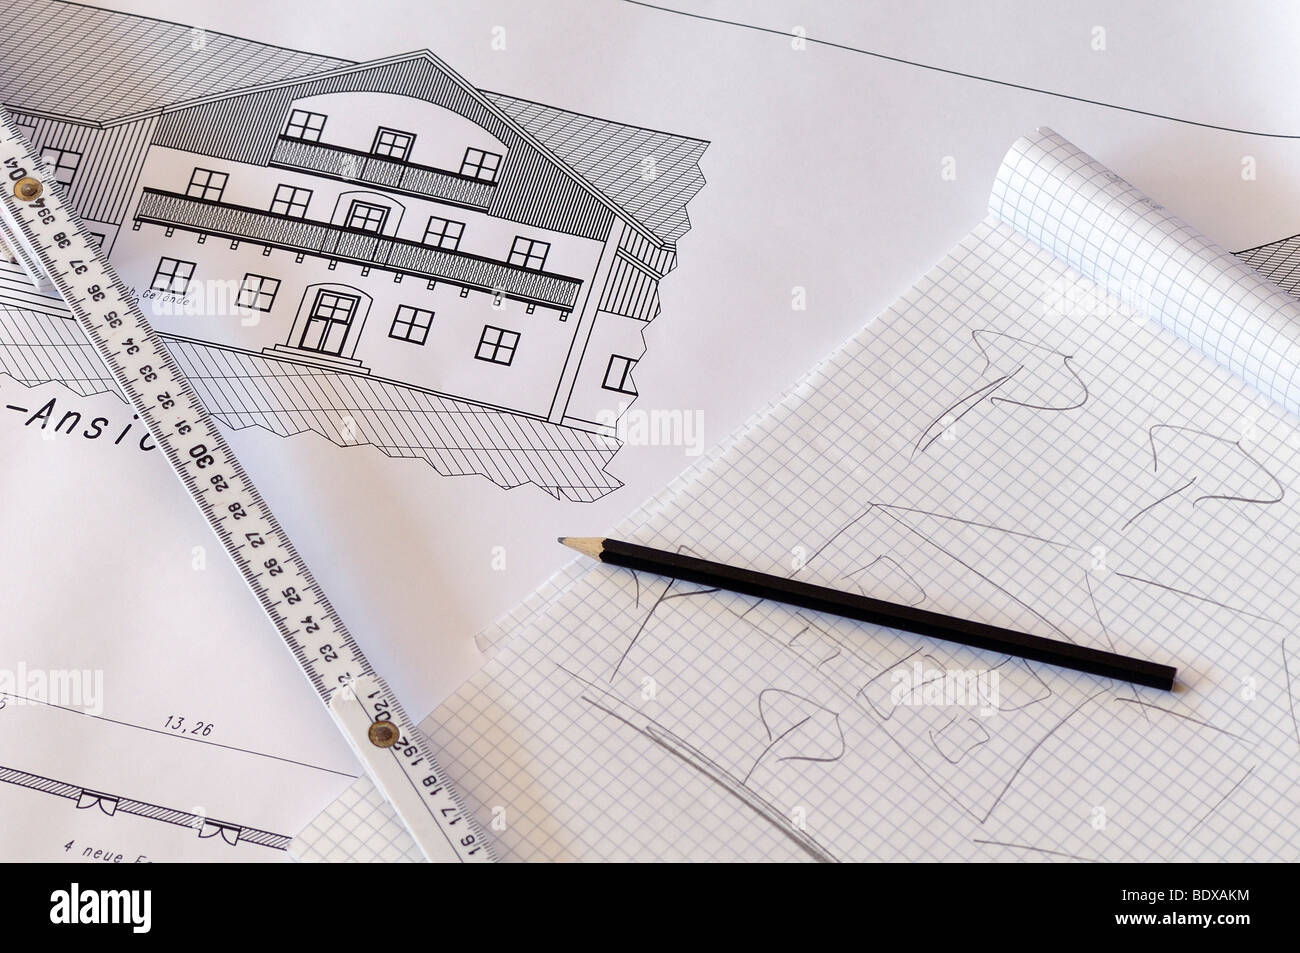 Sector Sketch Stockfotos & Sector Sketch Bilder - Alamy